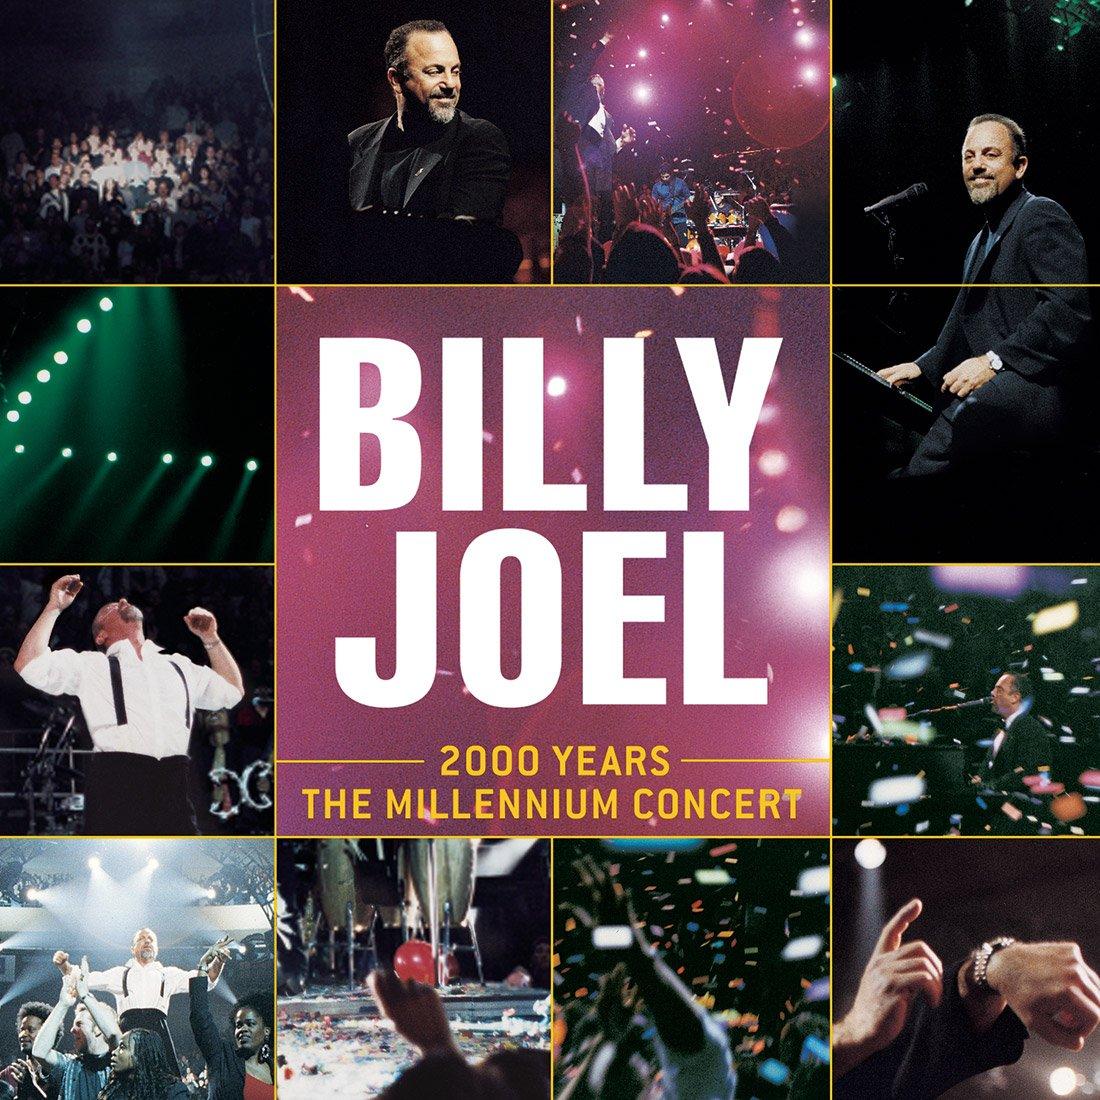 Billy Joel - 2000 Years - The Millennium Concert